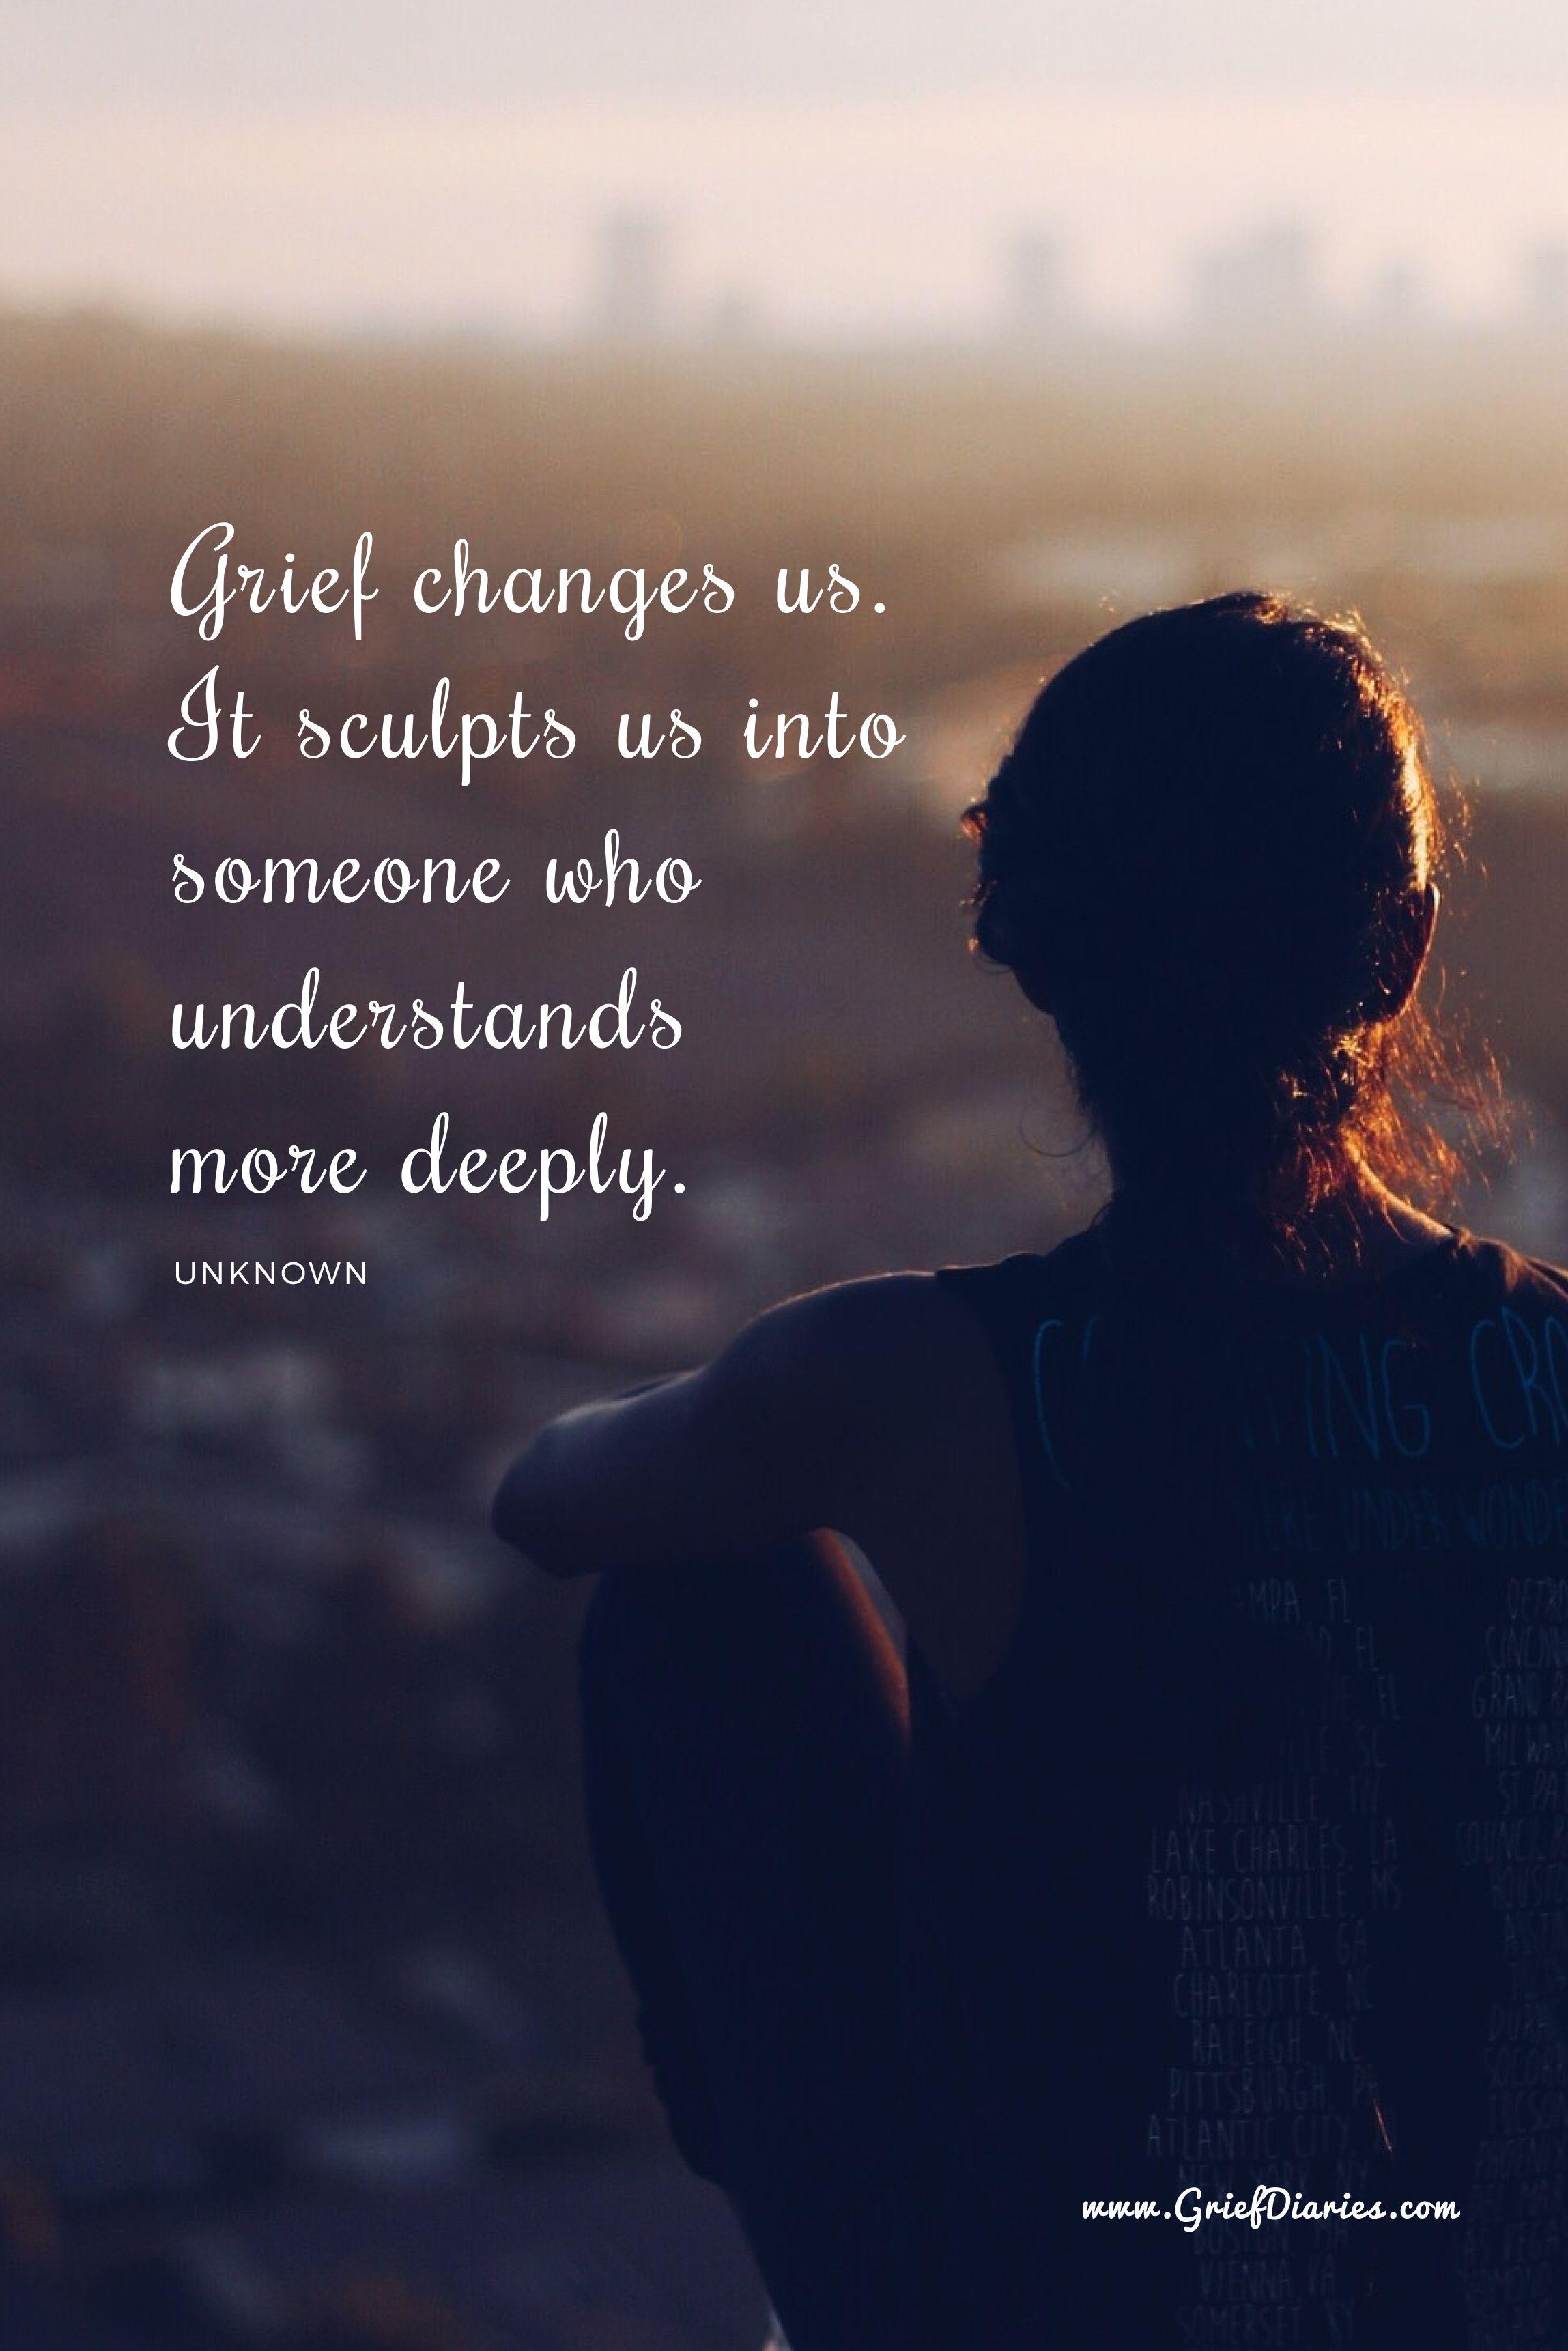 Shared sorrow is half a sorrow join us grief griefdiaries hope